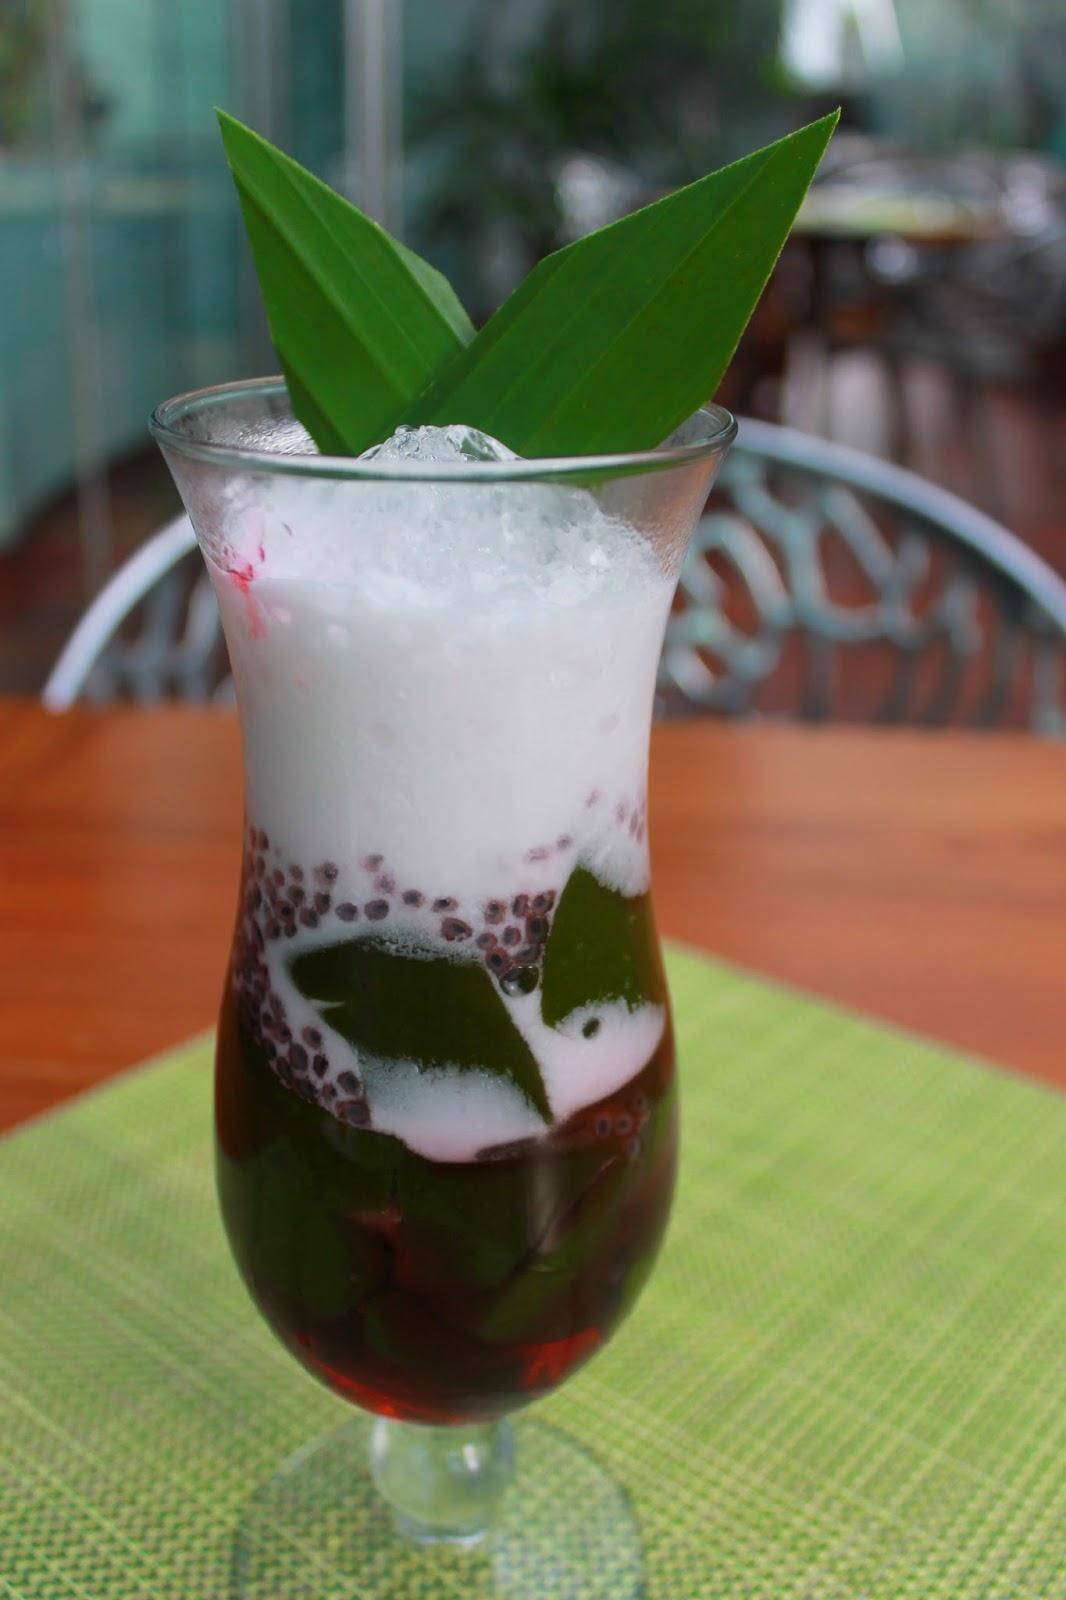 Resep Minuman Sederhana Untuk Buka Puasa: Es Cincau Hijau